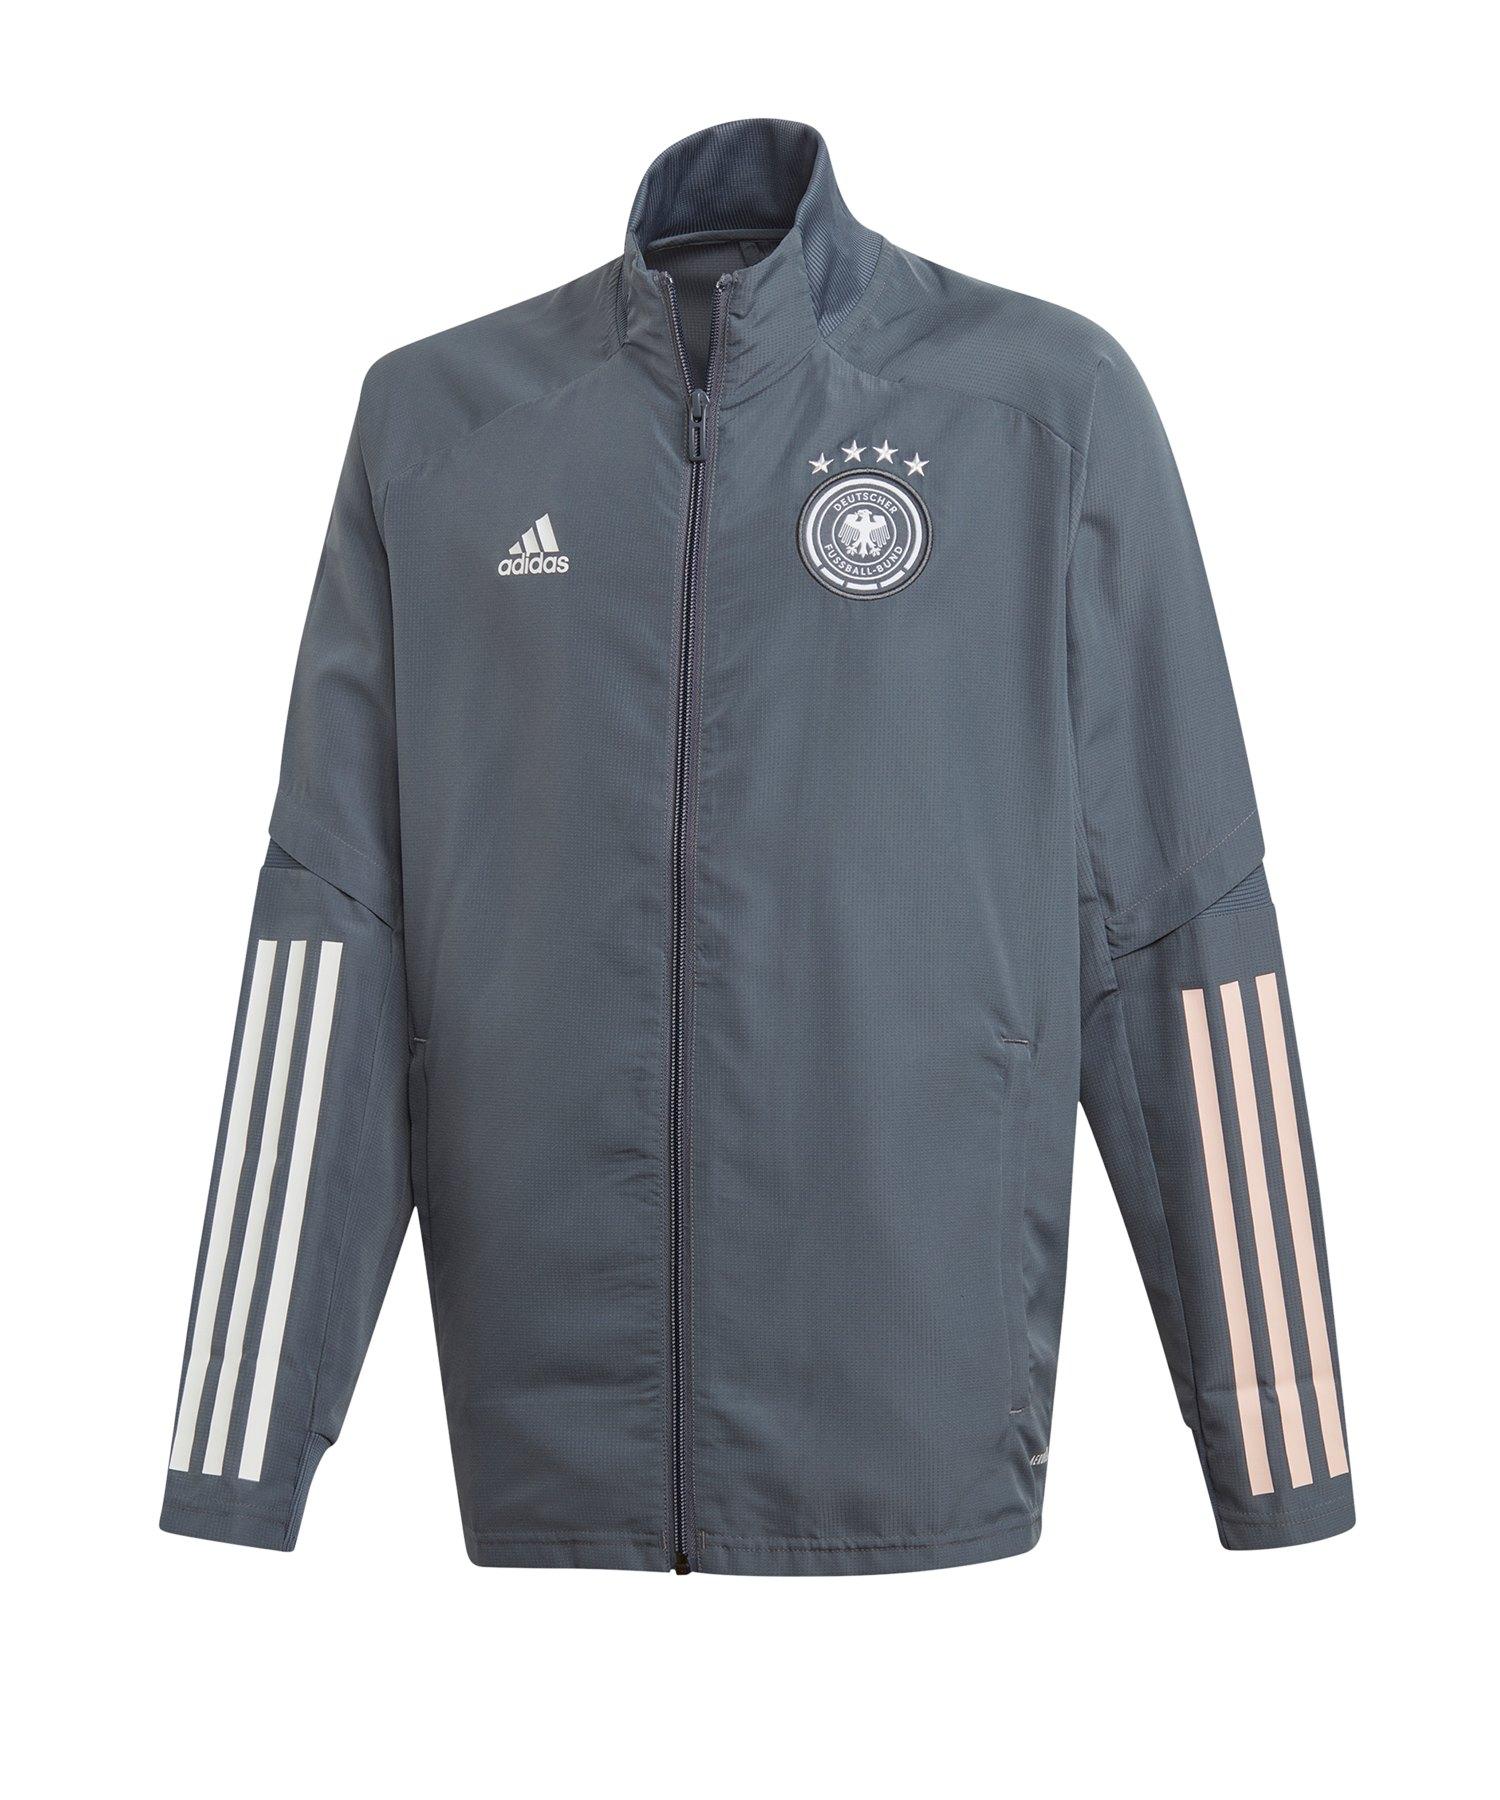 adidas DFB Deutschland Trainingsjacke Kids Grau - grau